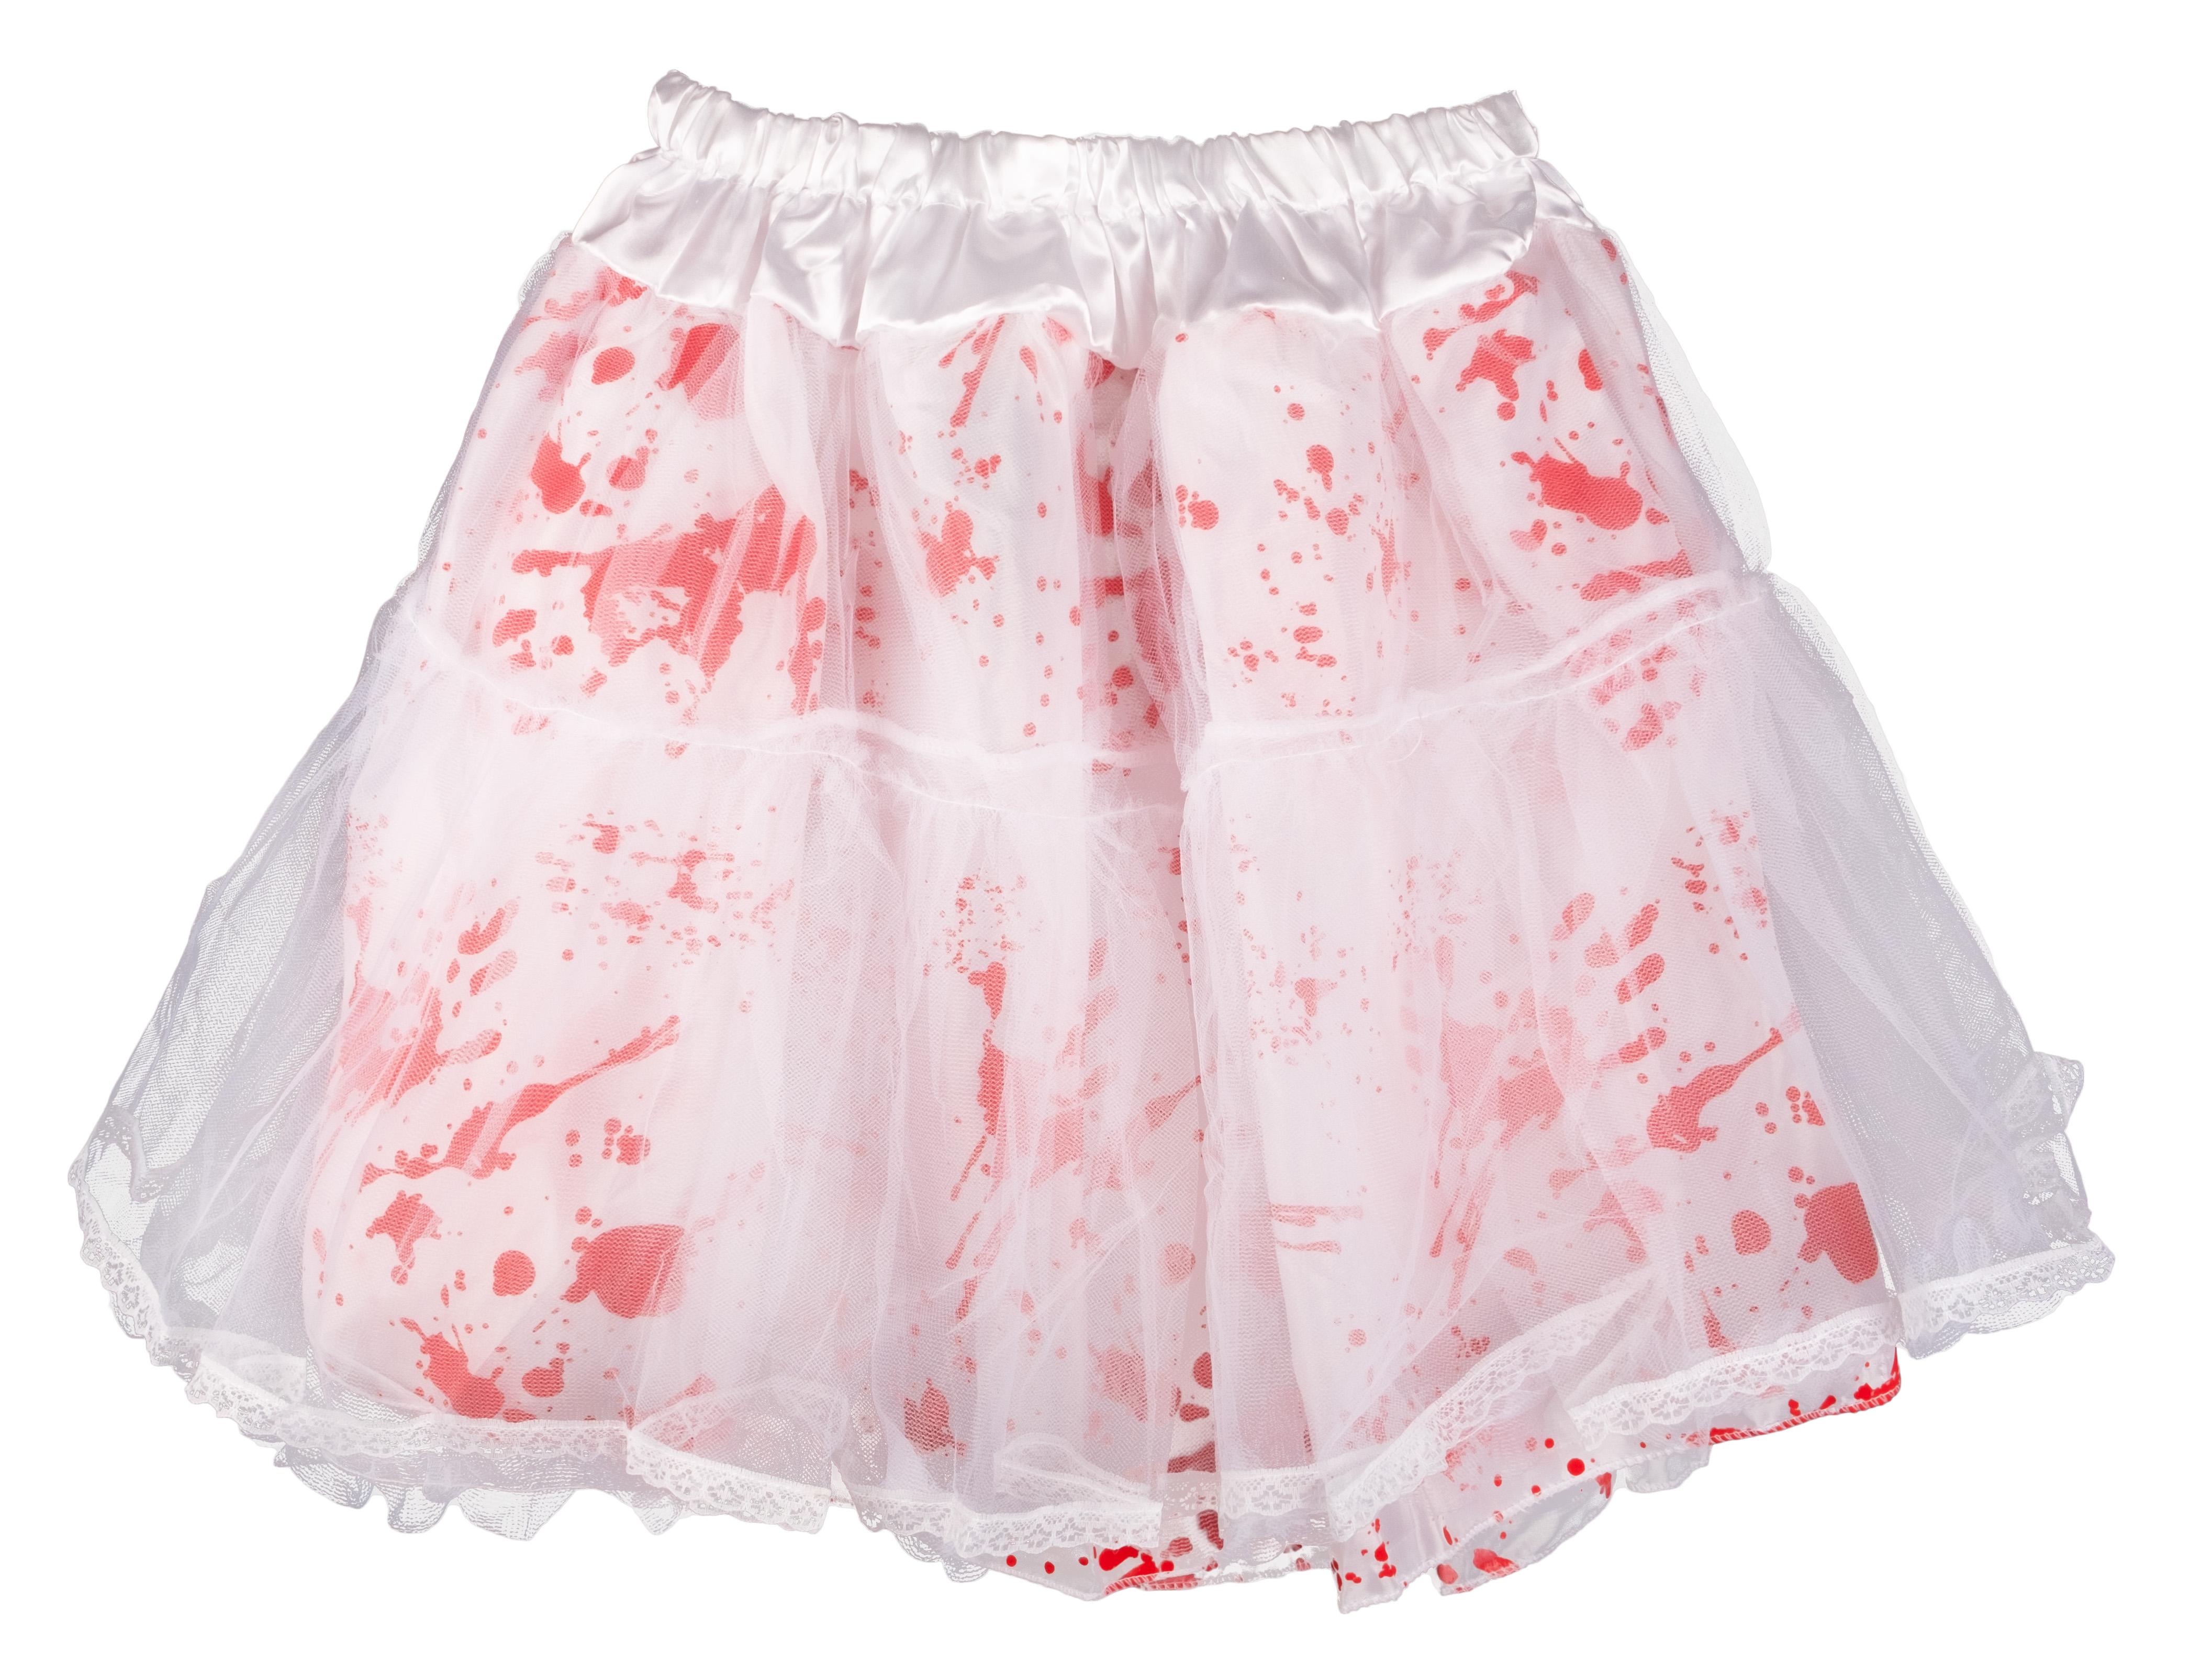 Petticoat 50cm lang weiß mit Blut